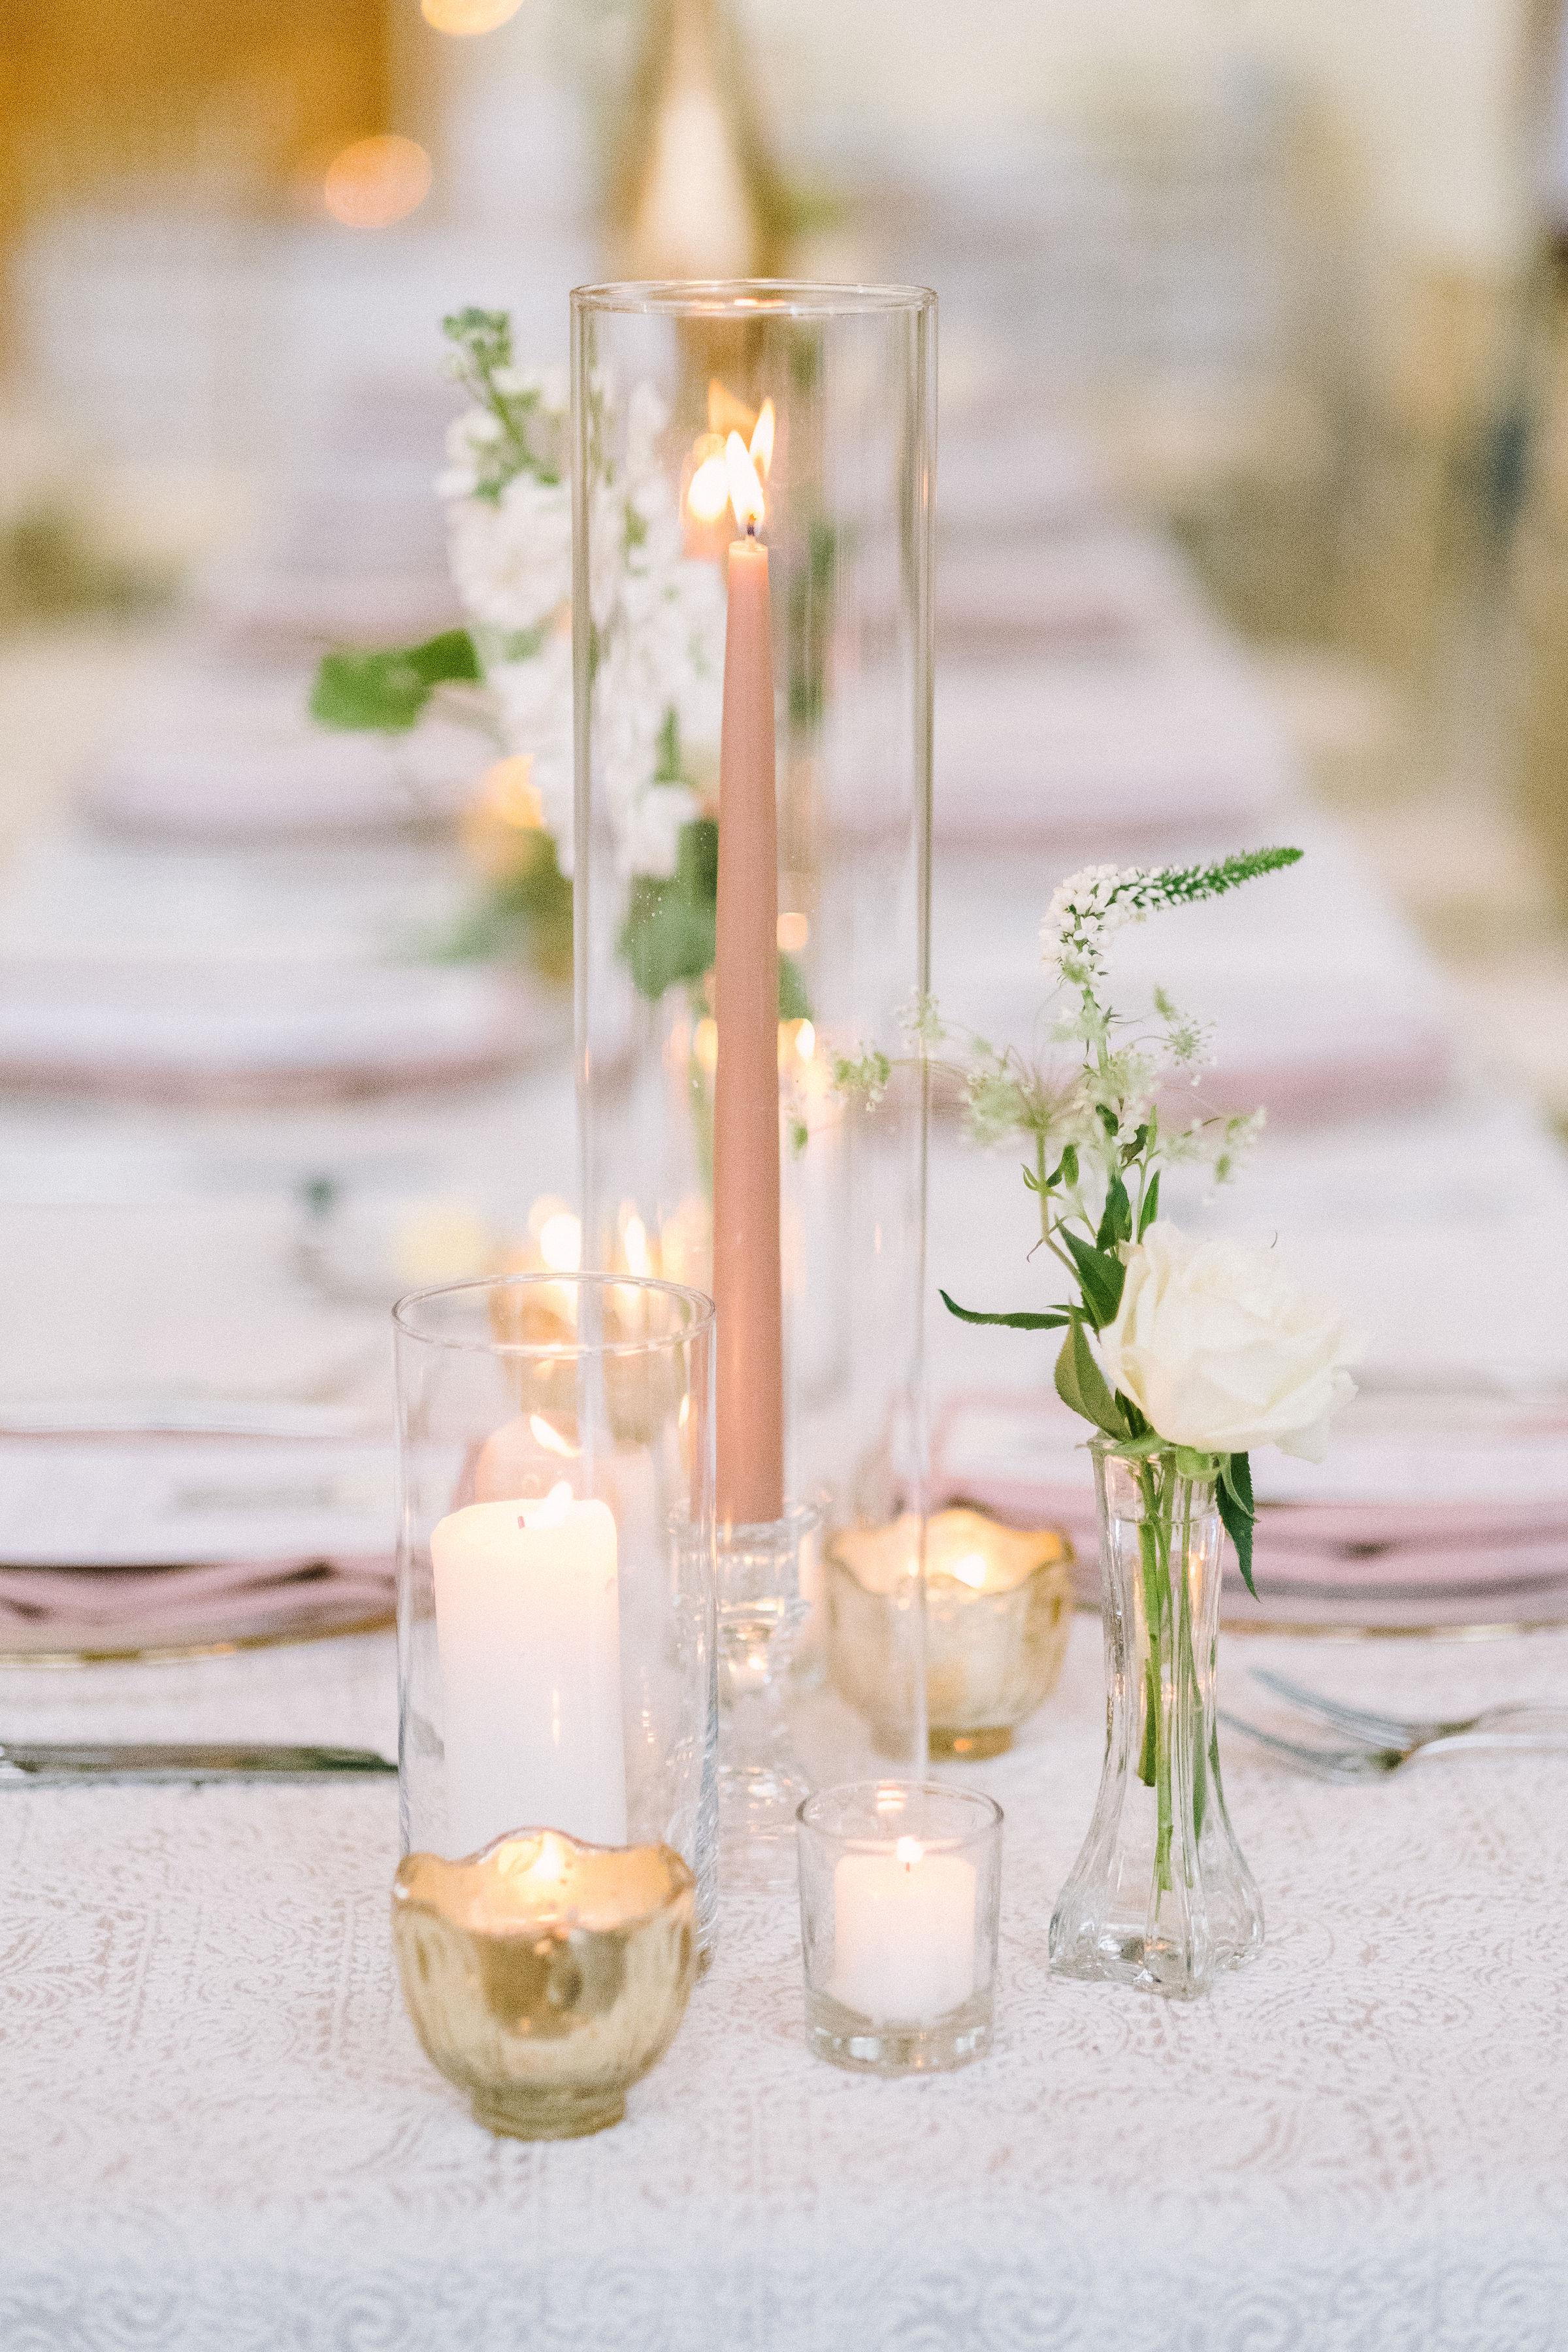 Ellen-Ashton-Photography-Girt-and-gold-events-weddings-Ashton-Depot-Weddings703.jpg